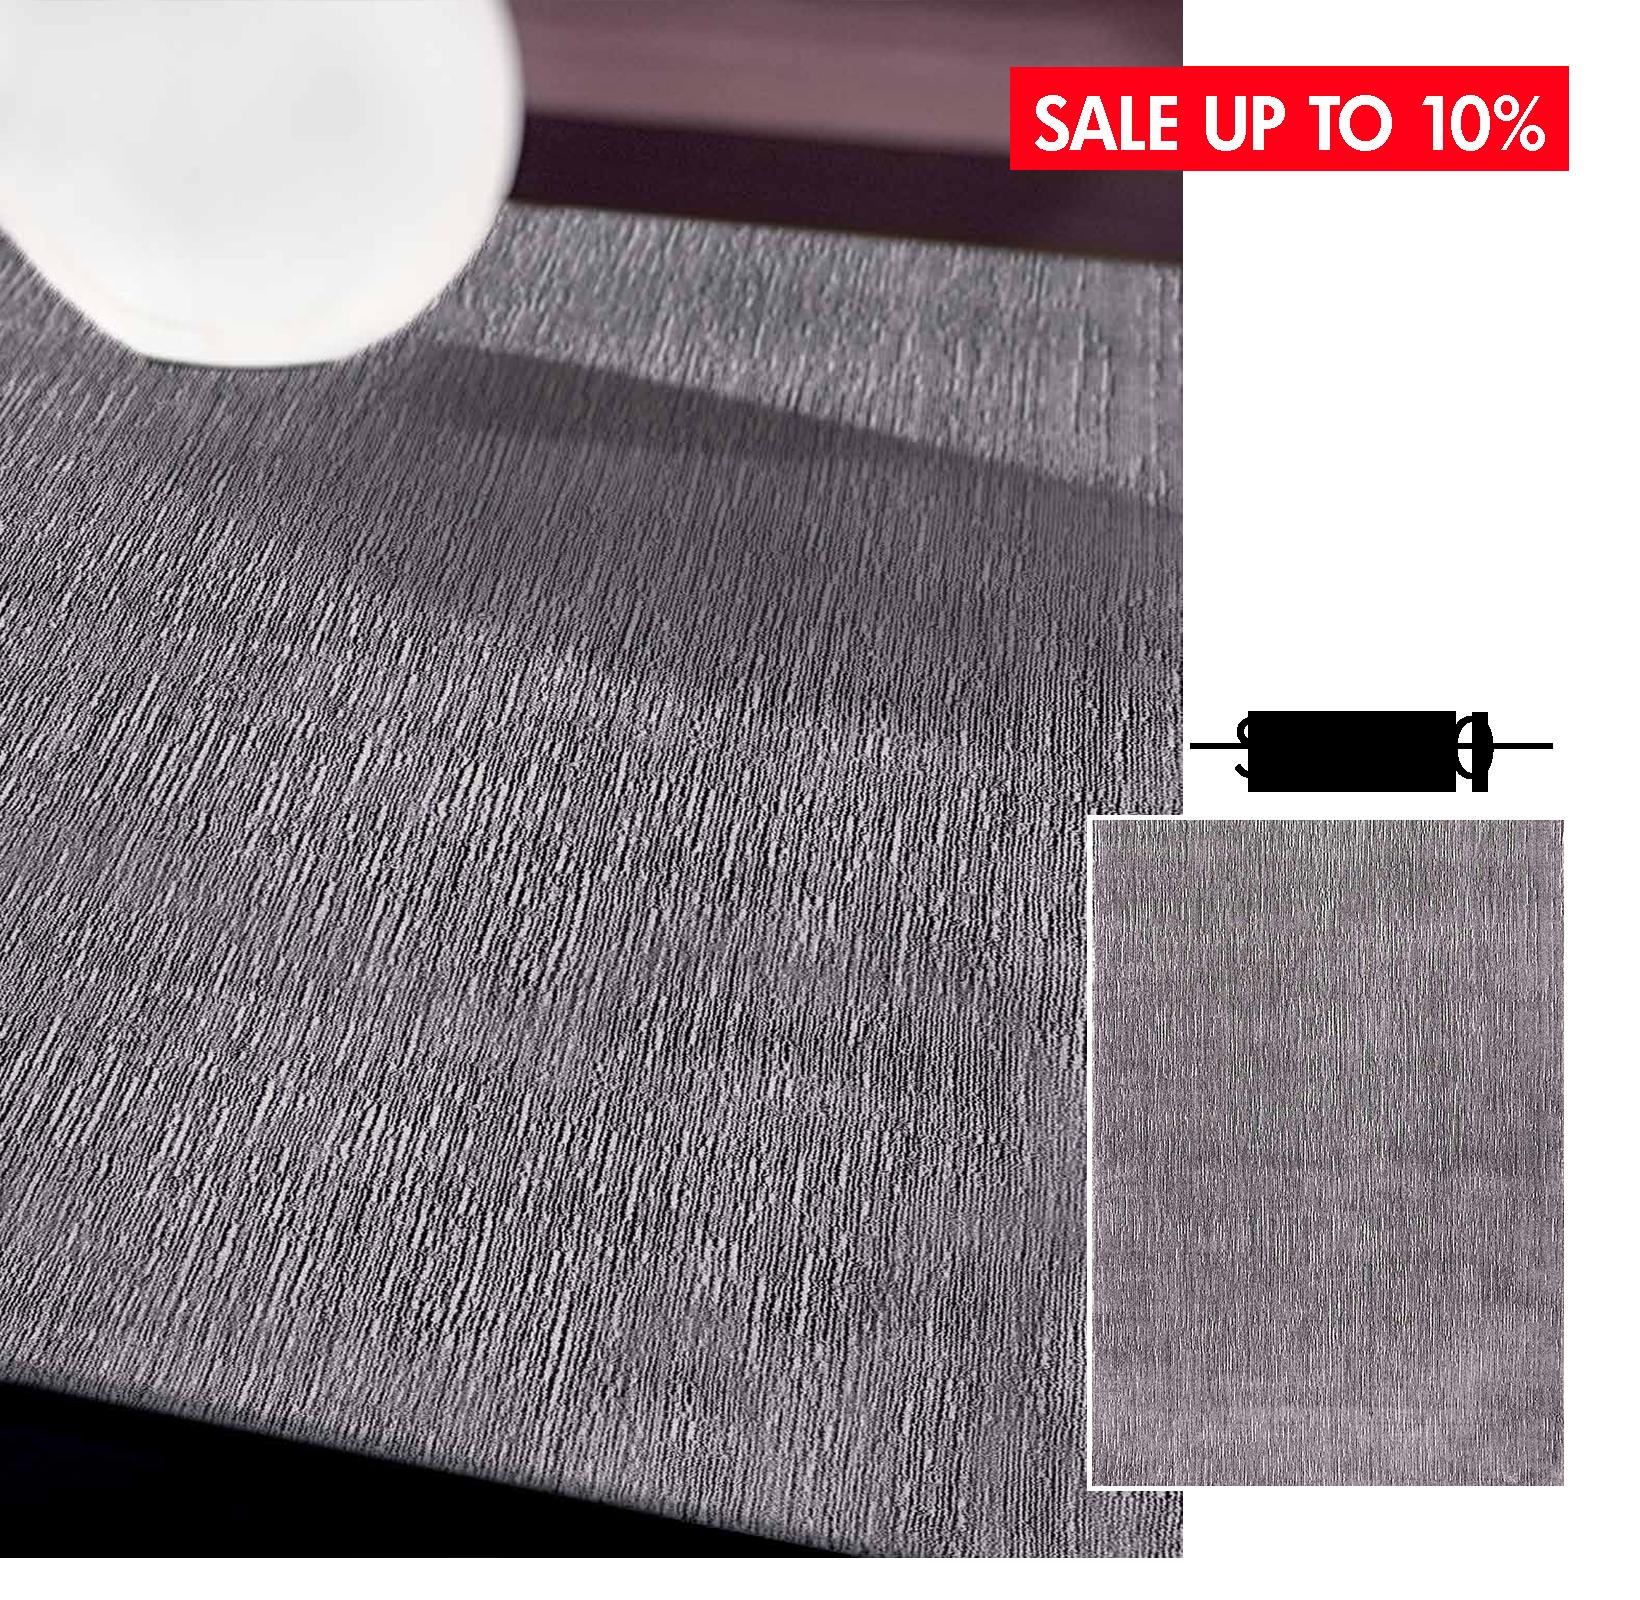 PLATFORM DUSTY LILAC - ● 160x230 cm● 60% tơ Viscose - 40% lông cừu● $ 1,001.0